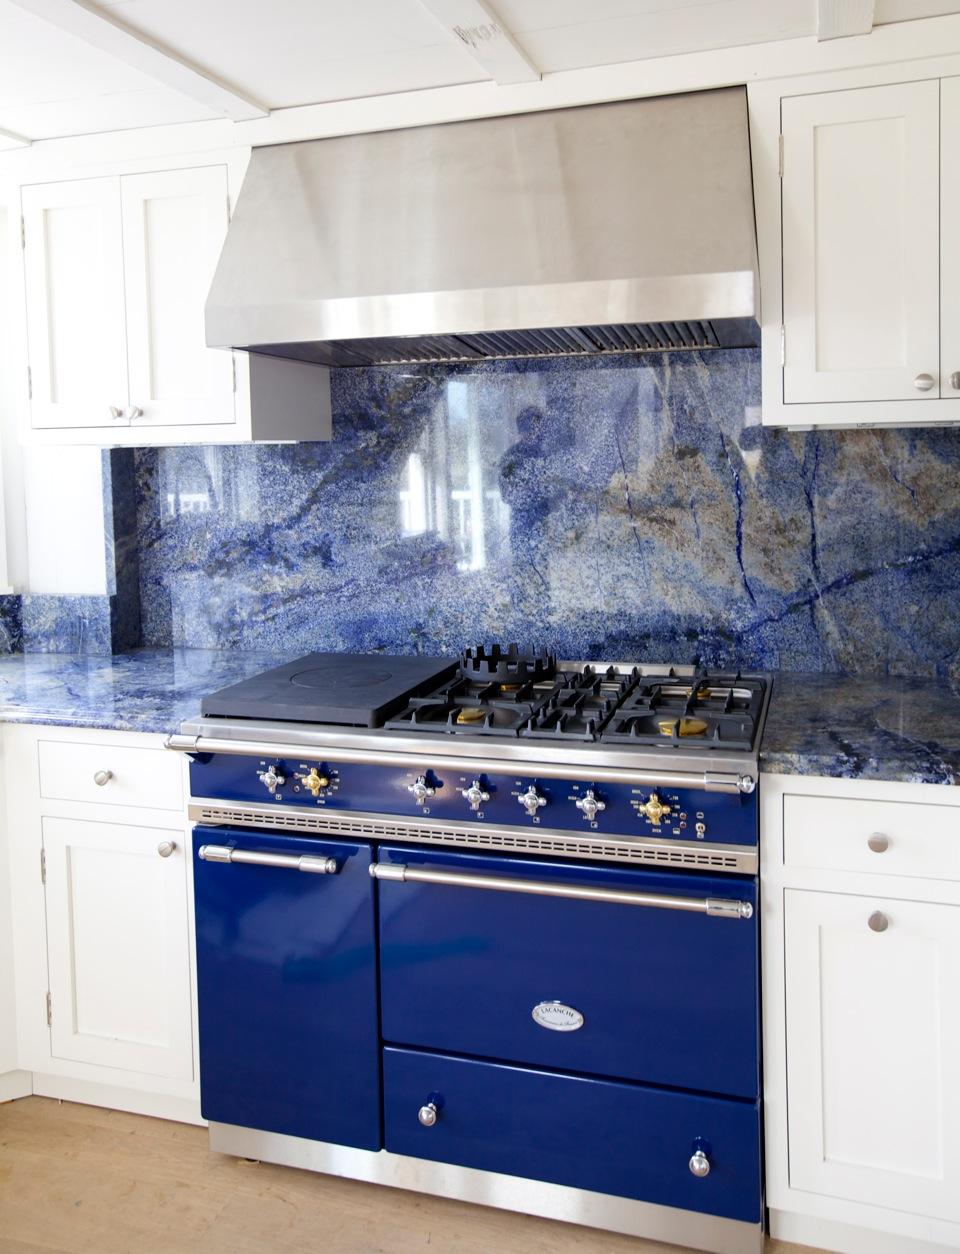 saulieu cooking range art culinaire lacanche usa. Black Bedroom Furniture Sets. Home Design Ideas